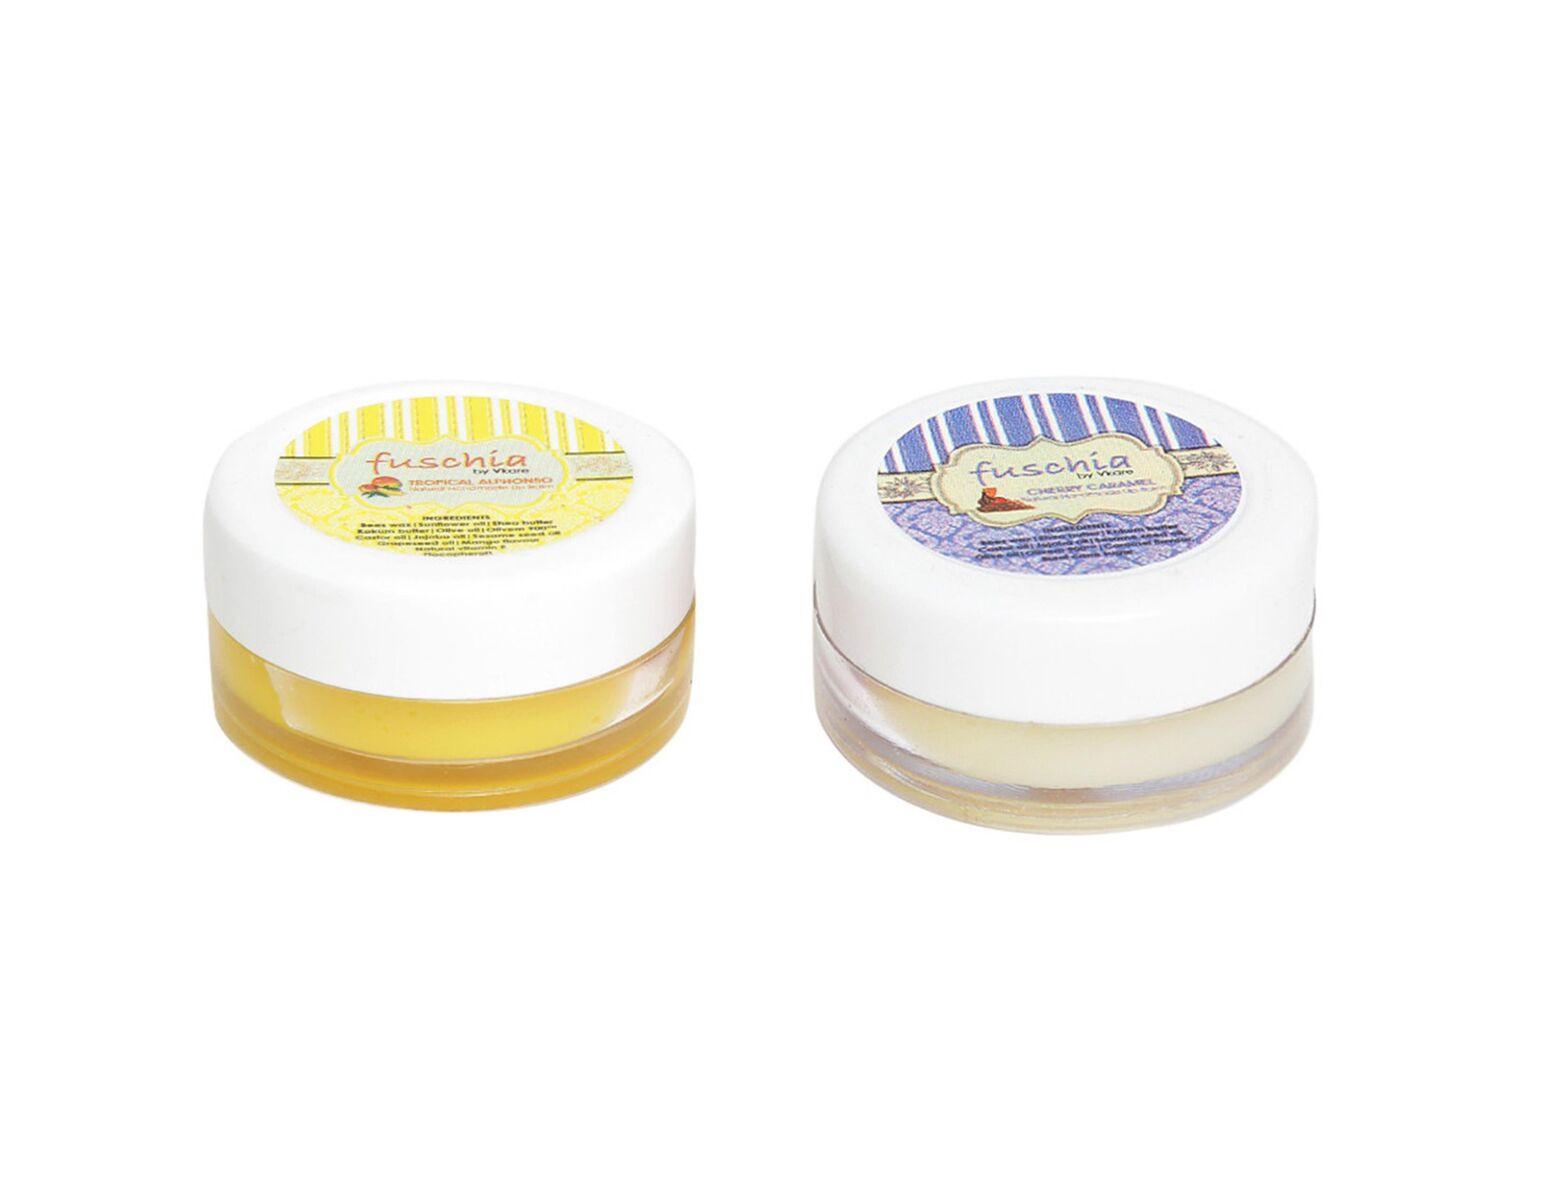 Fuschia – Caramel & Alphonso Lip Balm Combo 16gm